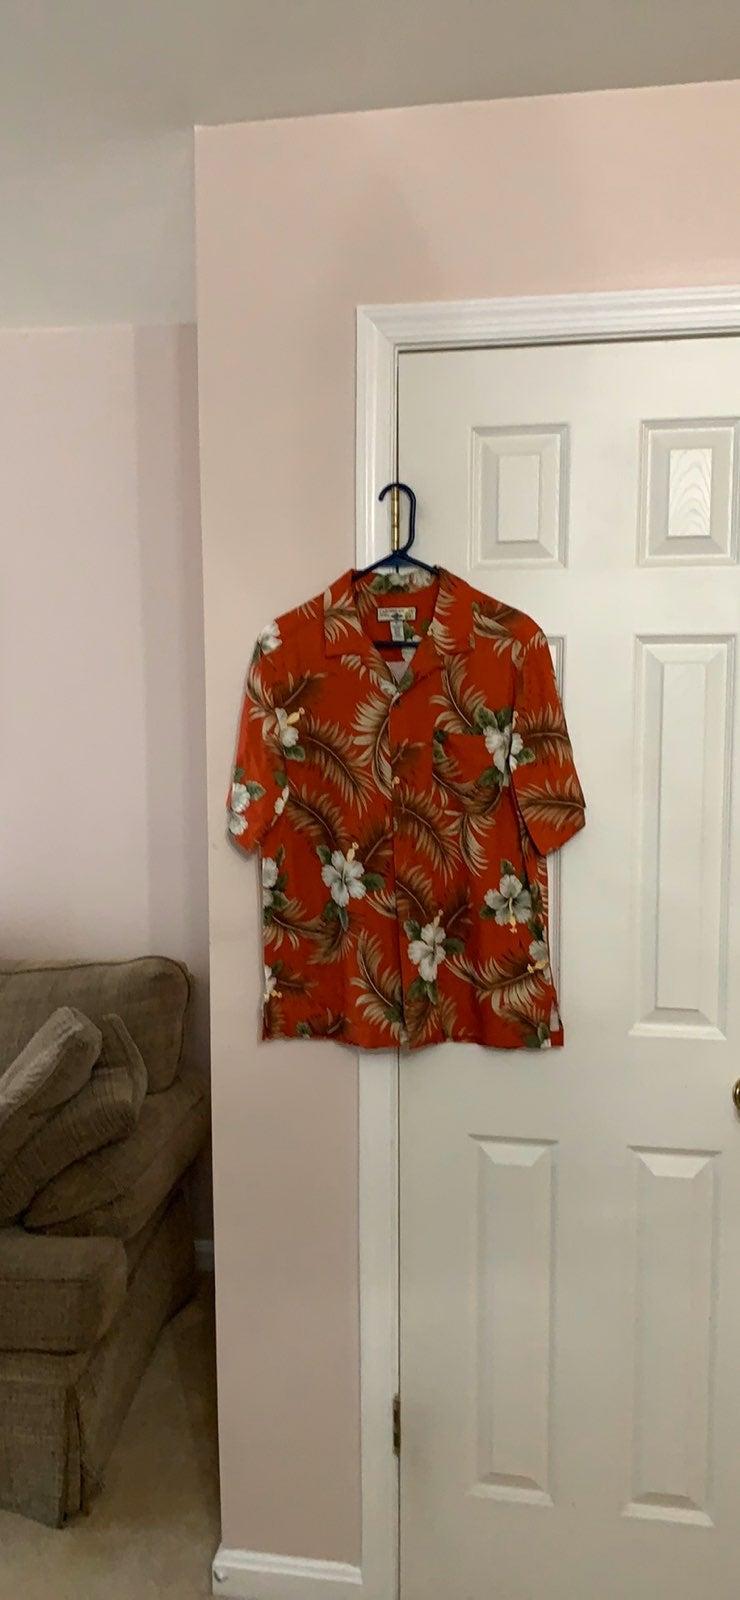 Men's Caribbean style button up shirt